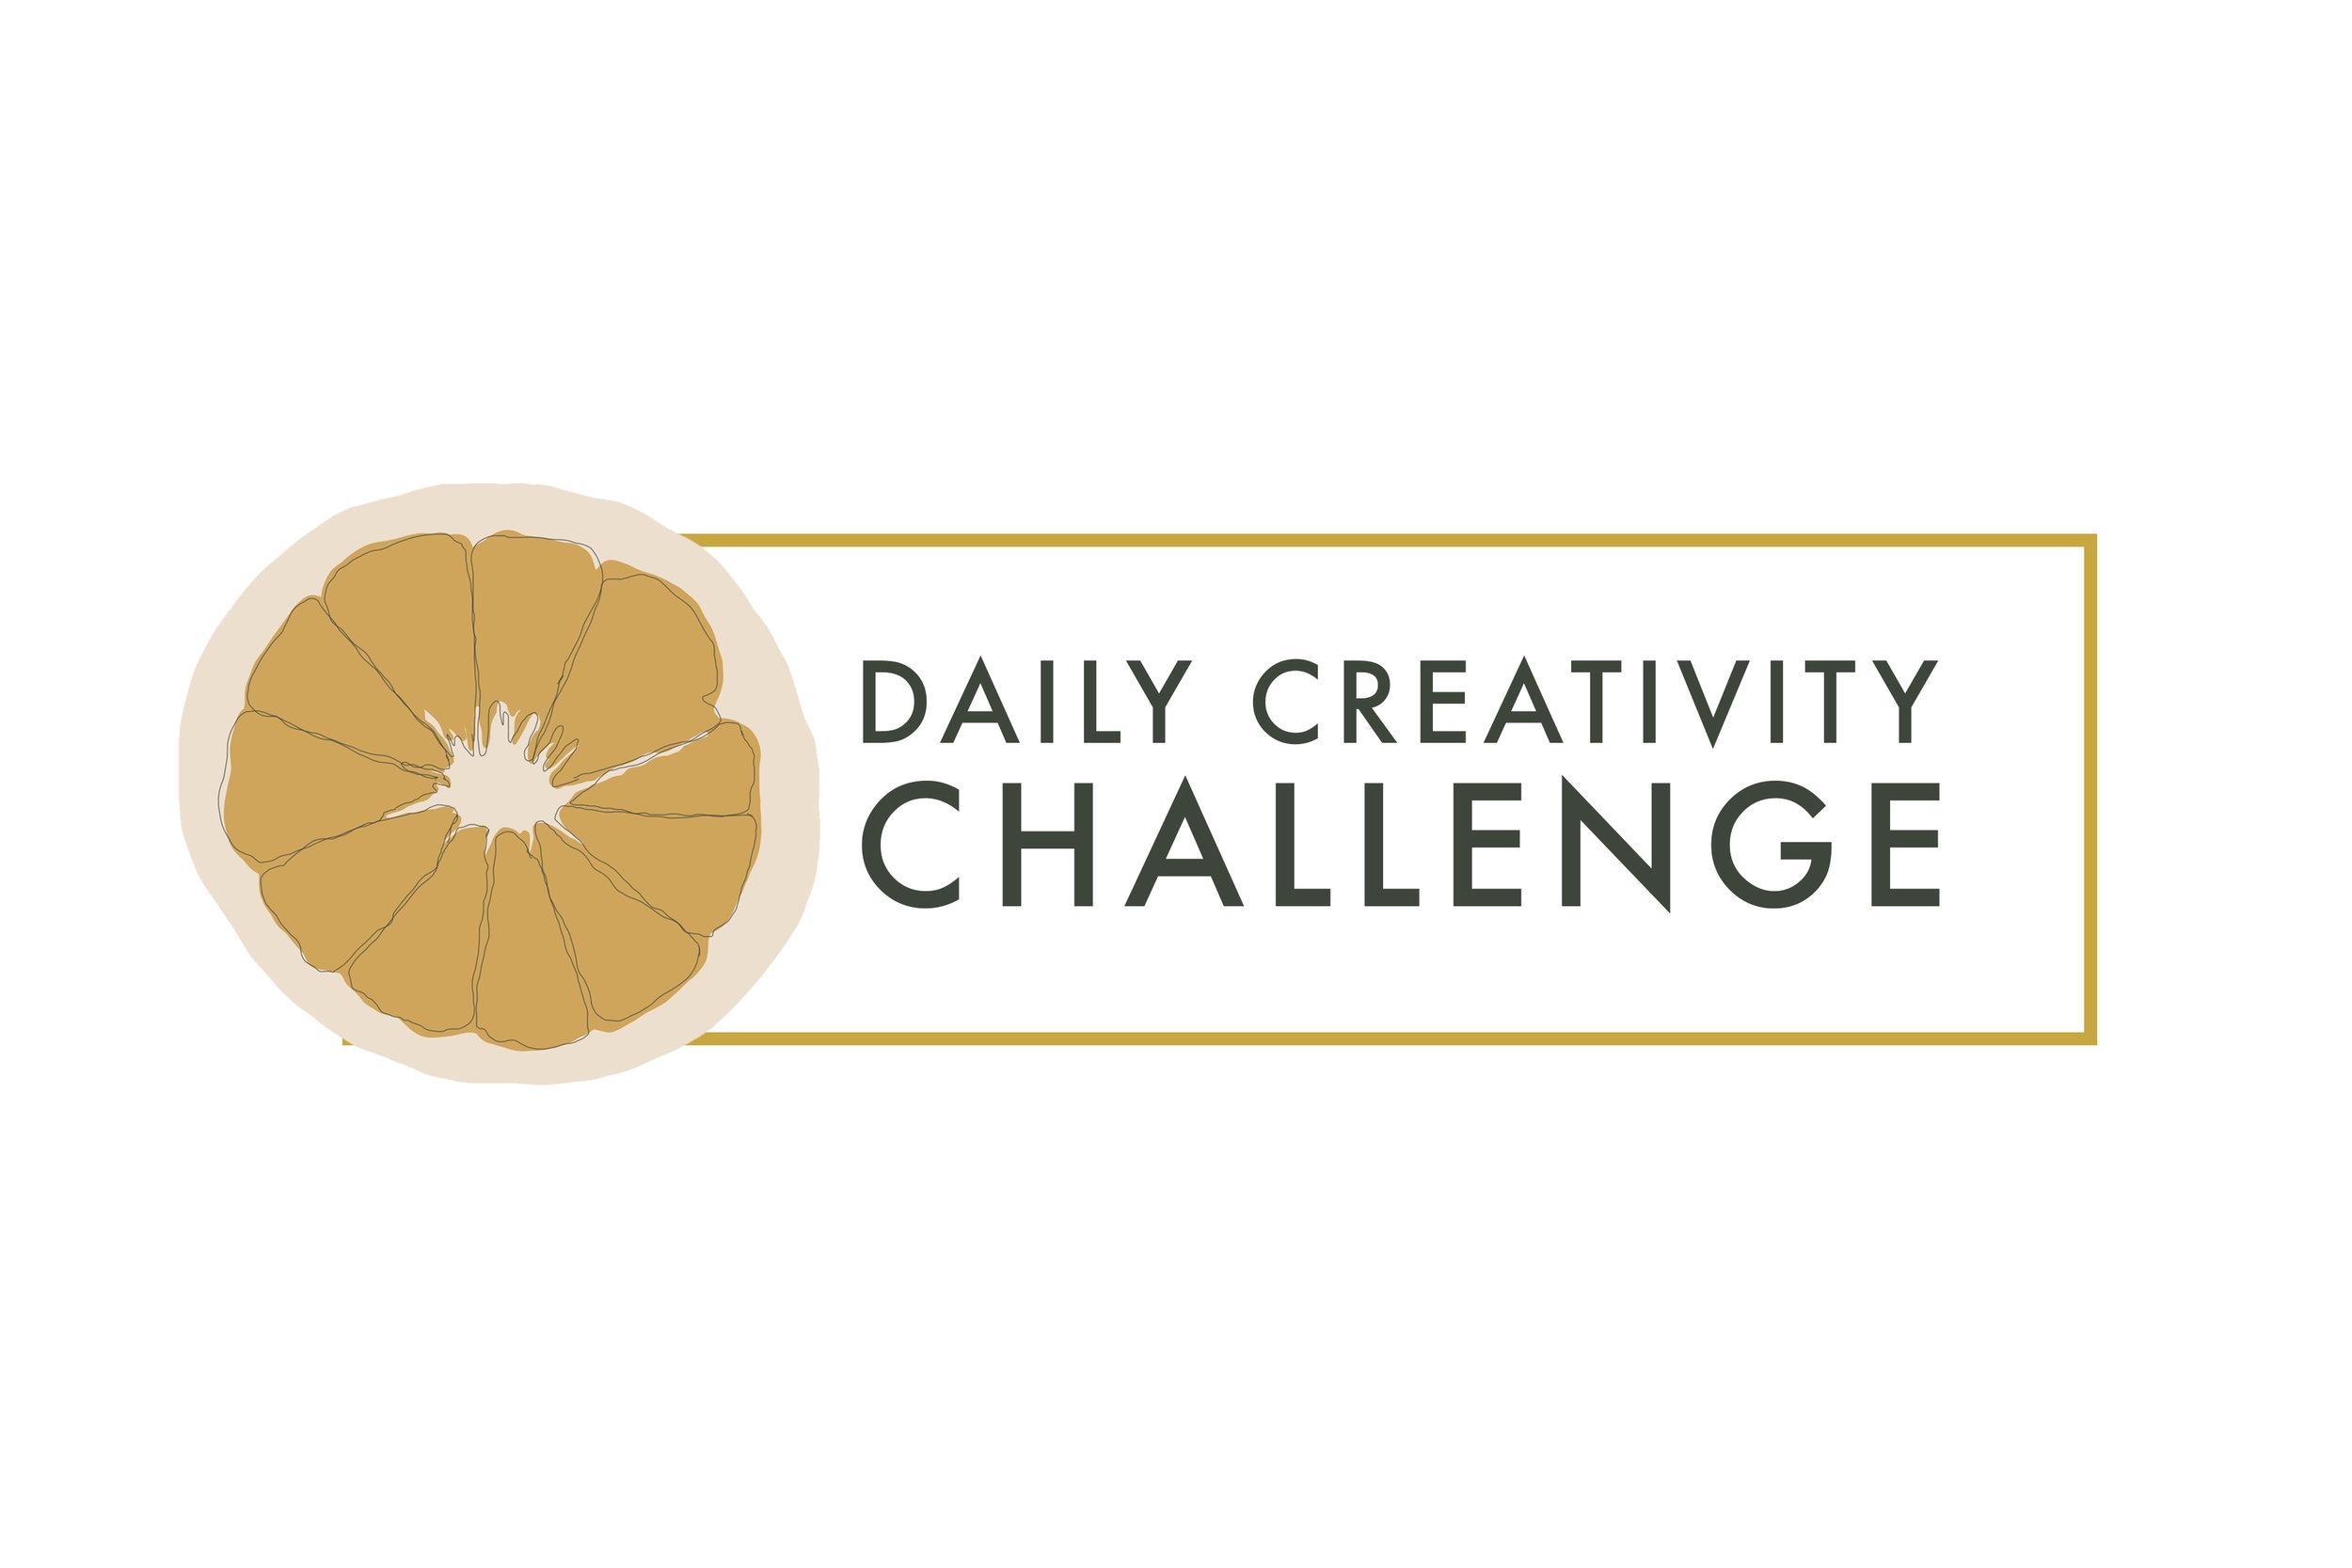 DAILY CREATIVITY CHALLENGE